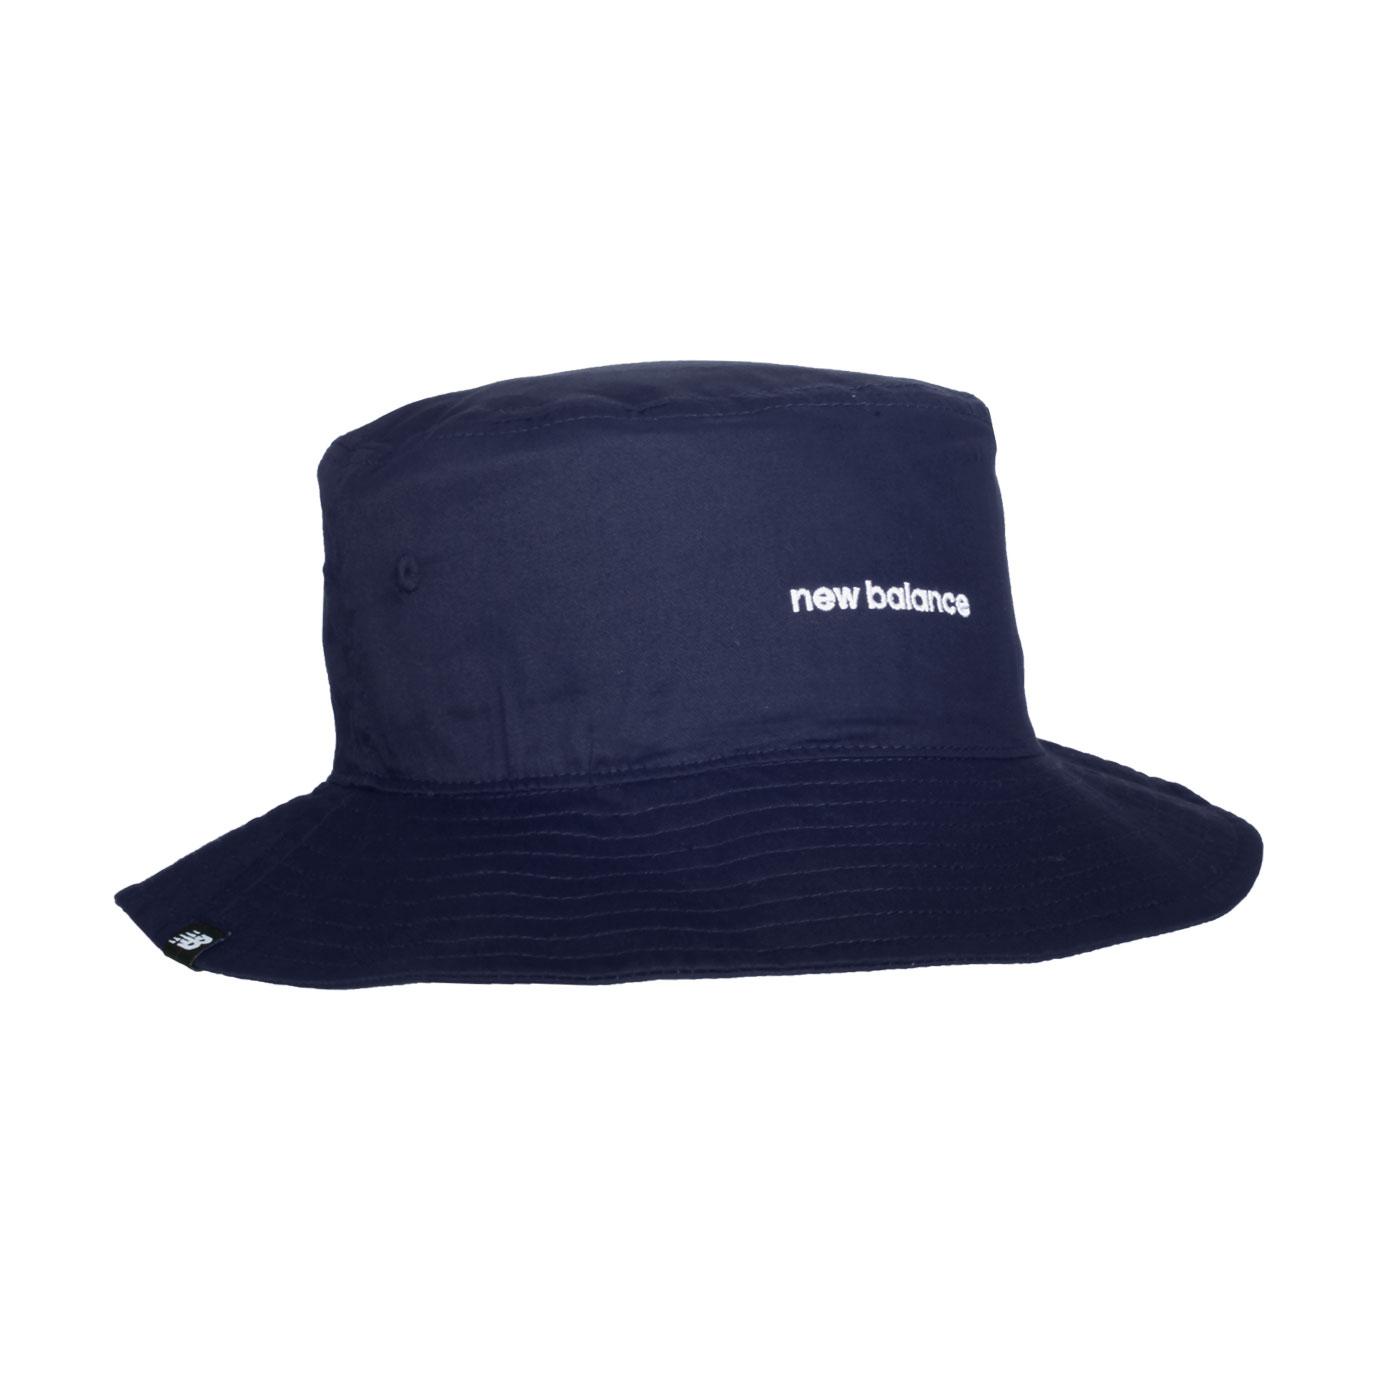 NEW BALANCE 漁夫帽 LAH13003TNV